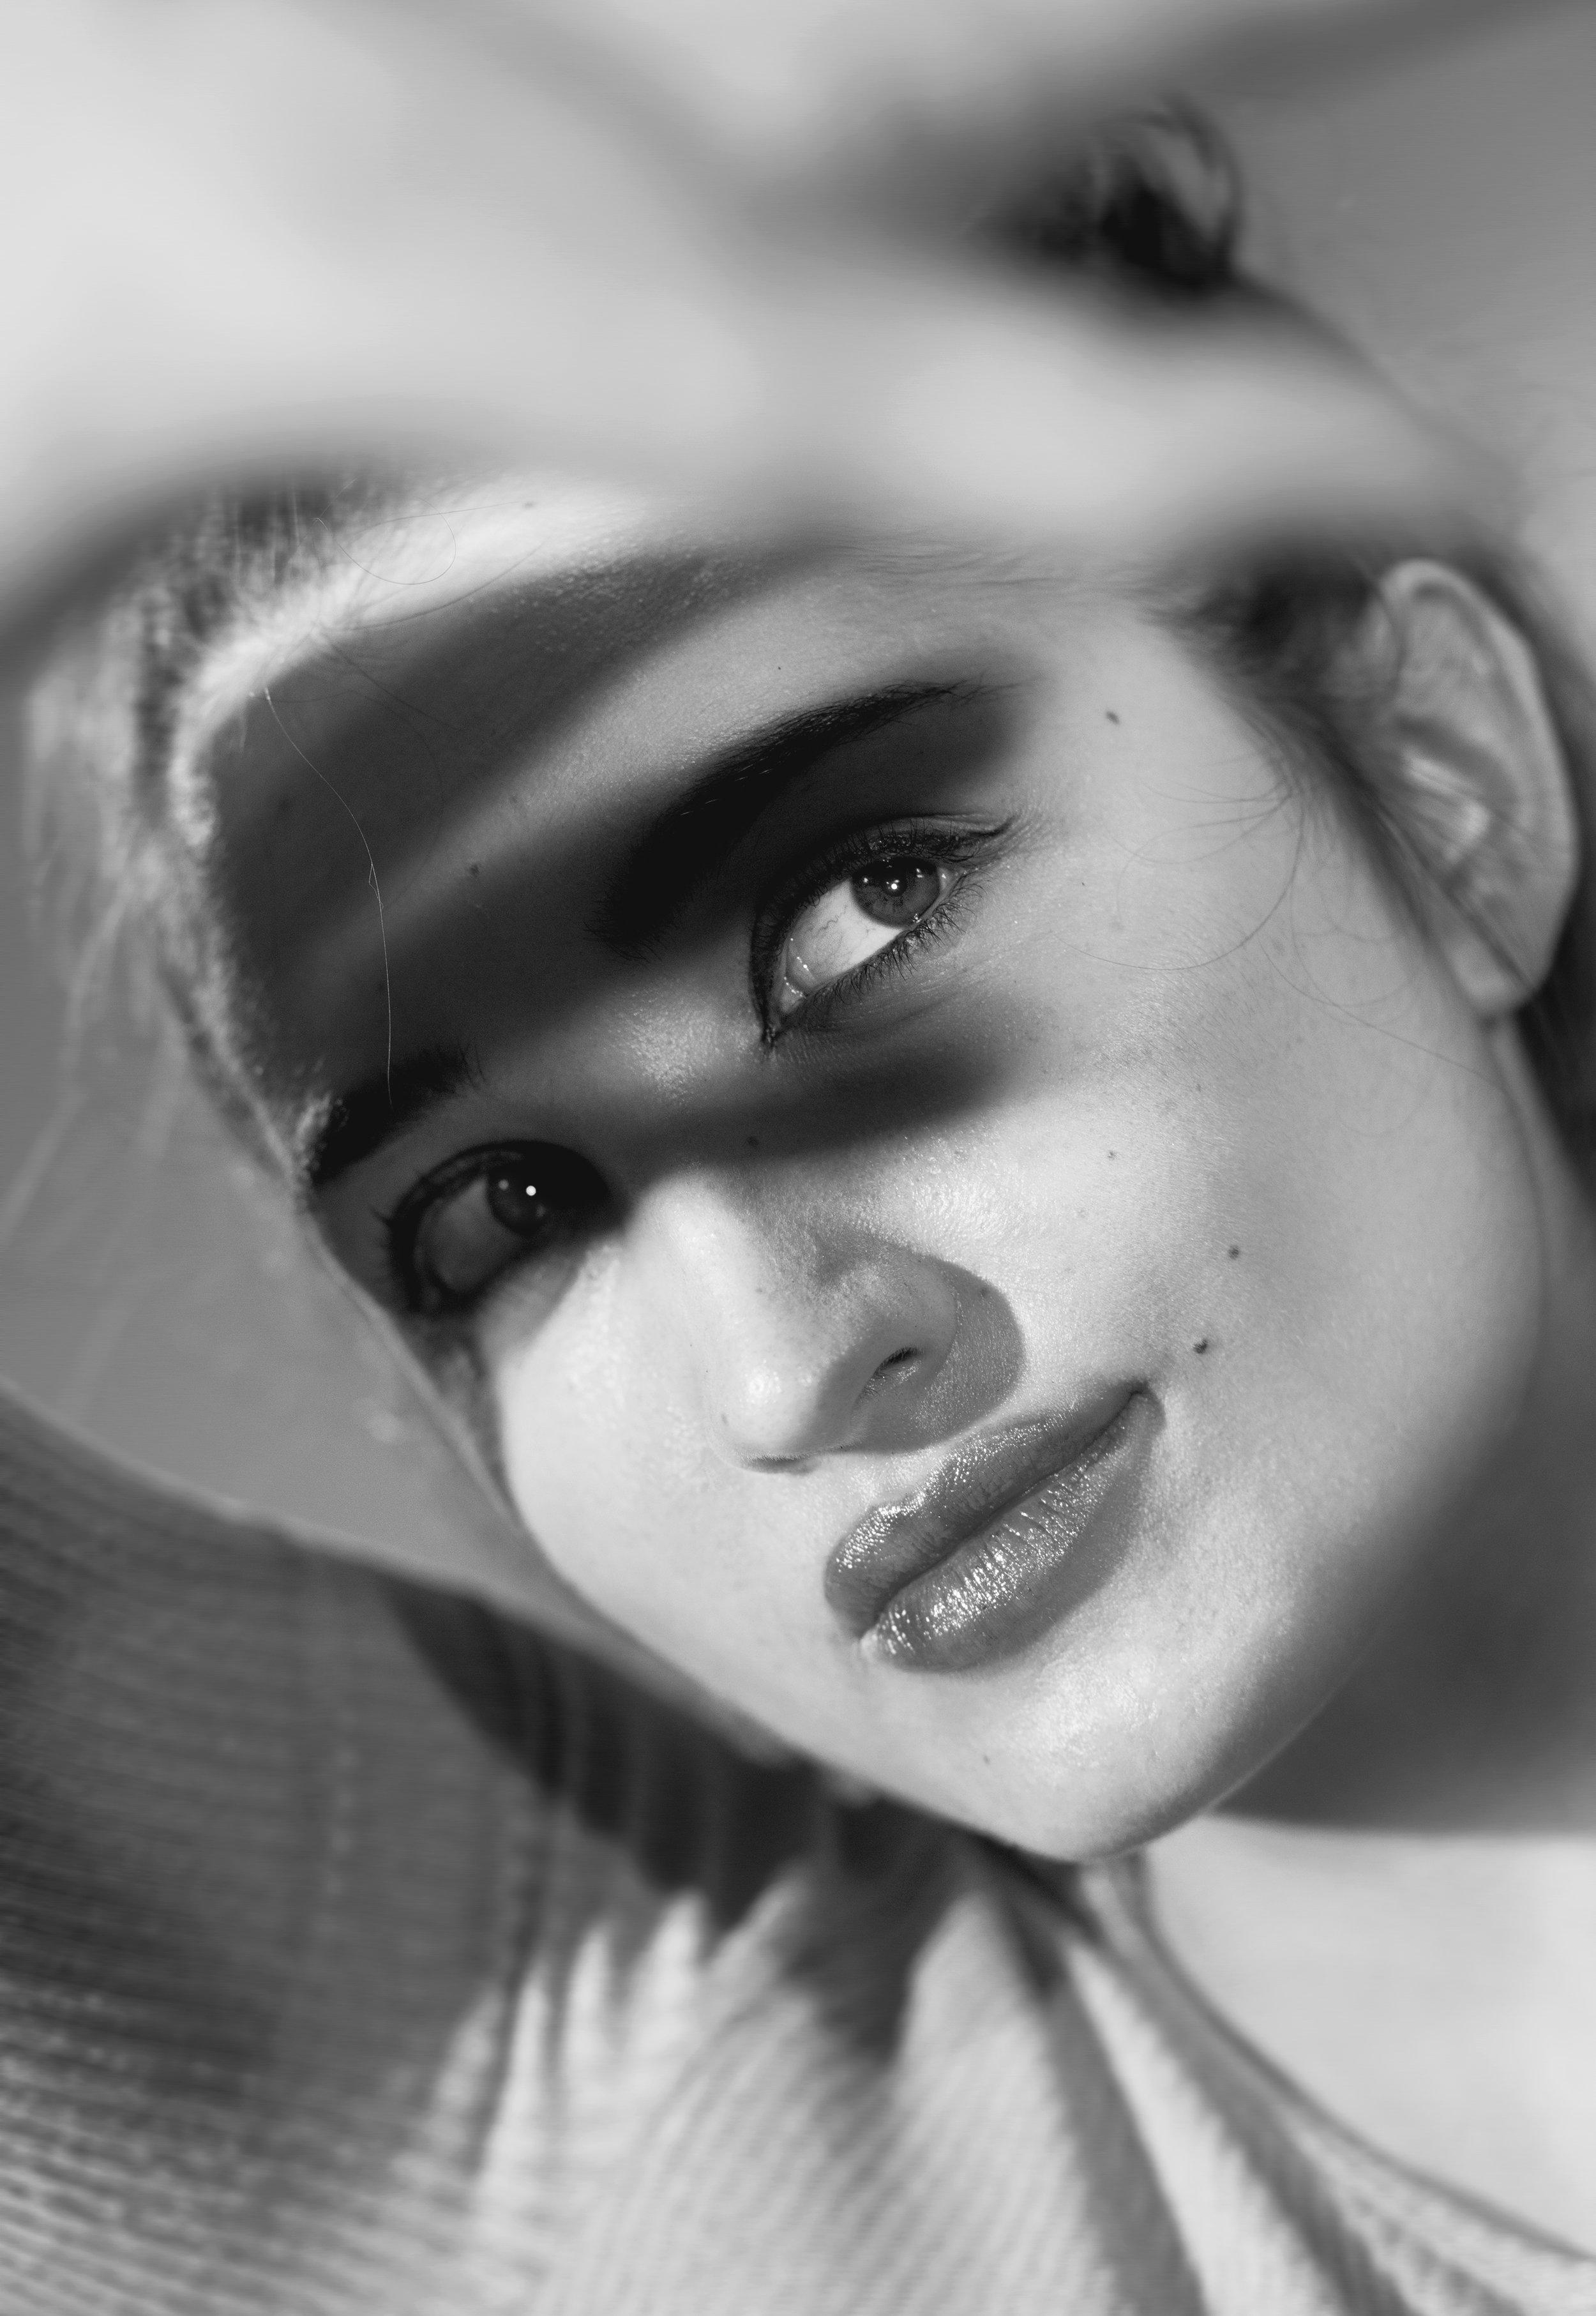 Ari_Portrait_Shadows_01_BW.jpg